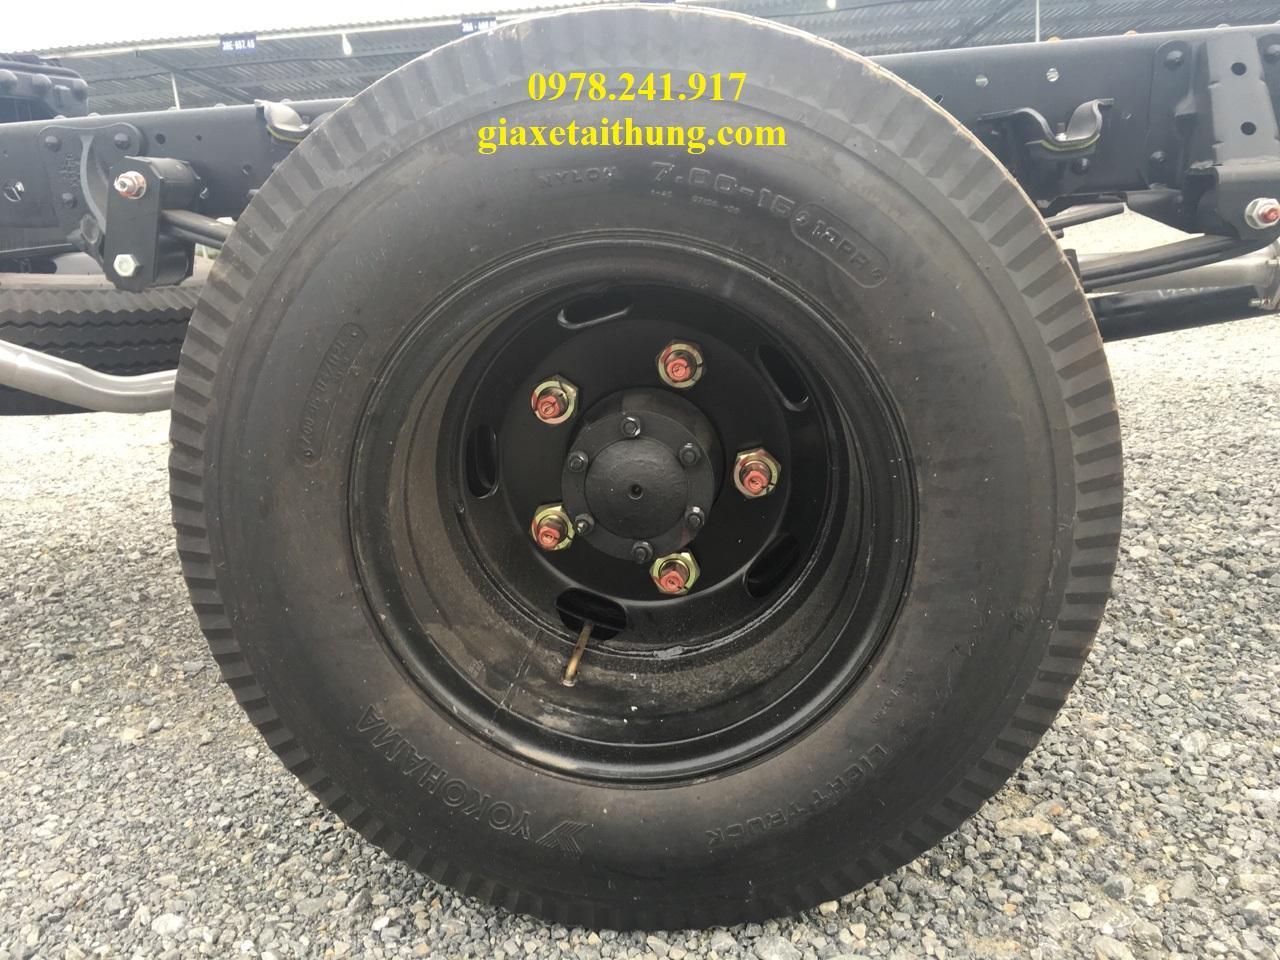 xe tải isuzu 1,1 tấn qkr77fe4, lốp xe